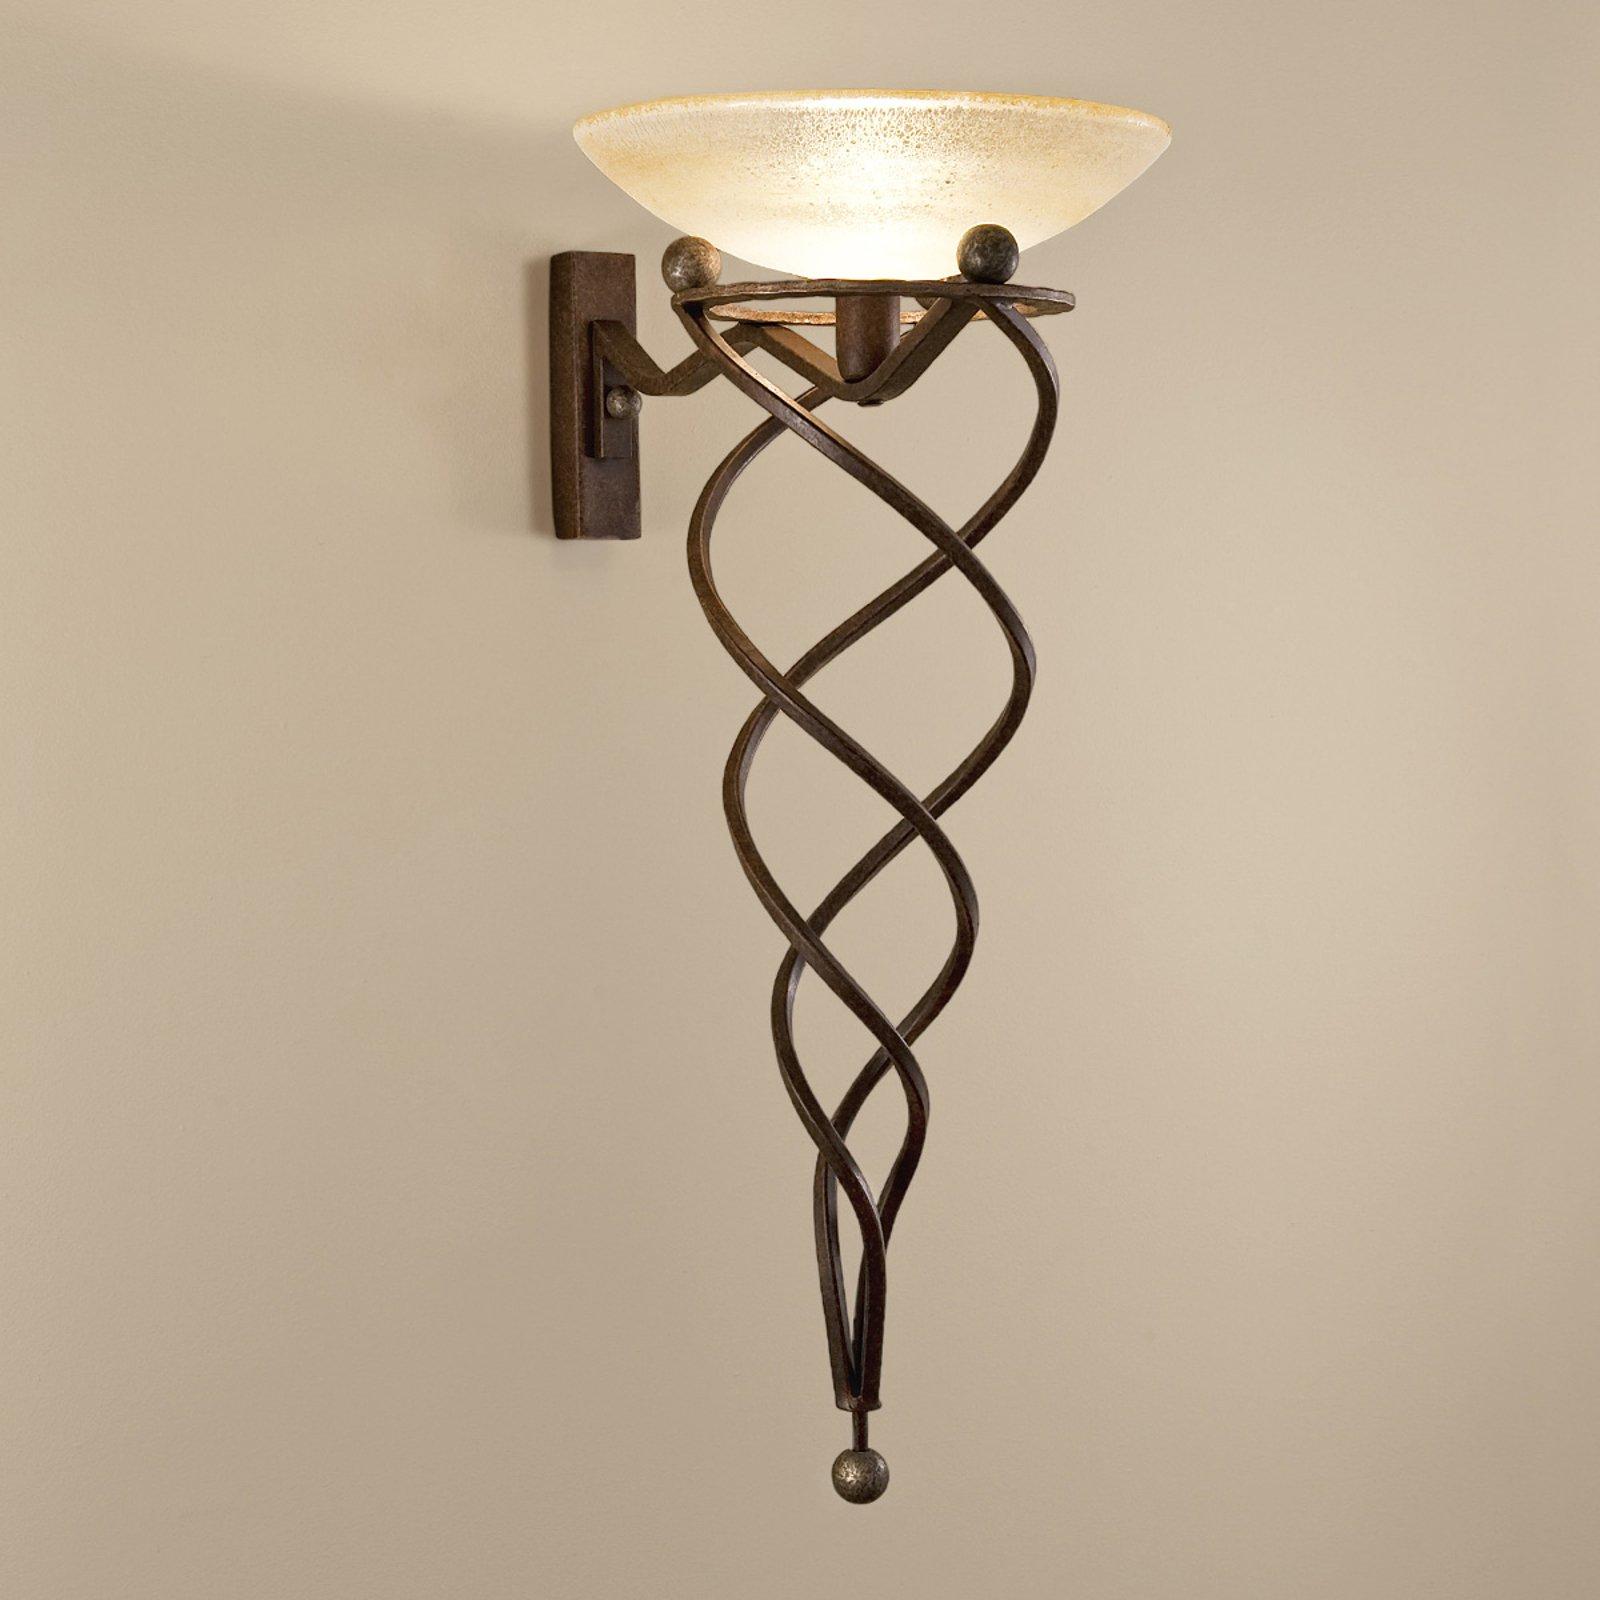 Vegglampe Antinea med Muranoglass